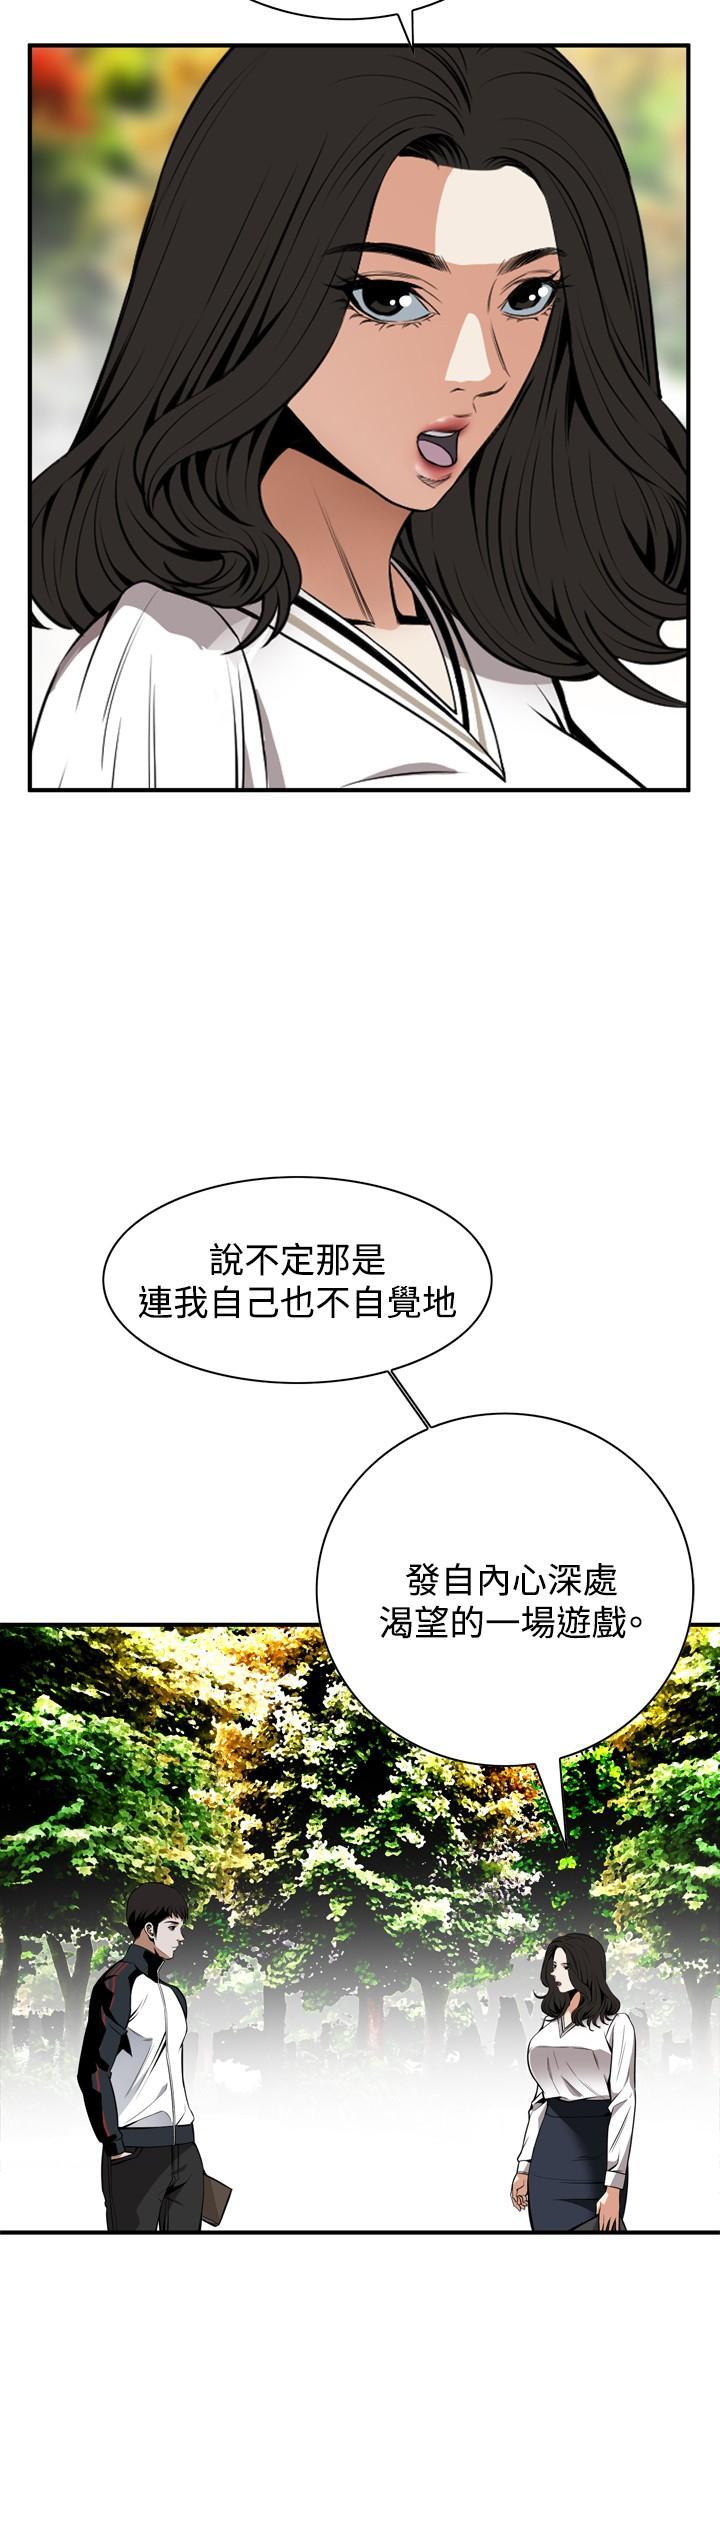 Take a Peek 偷窥 Ch.39~55 [Chinese]中文 97